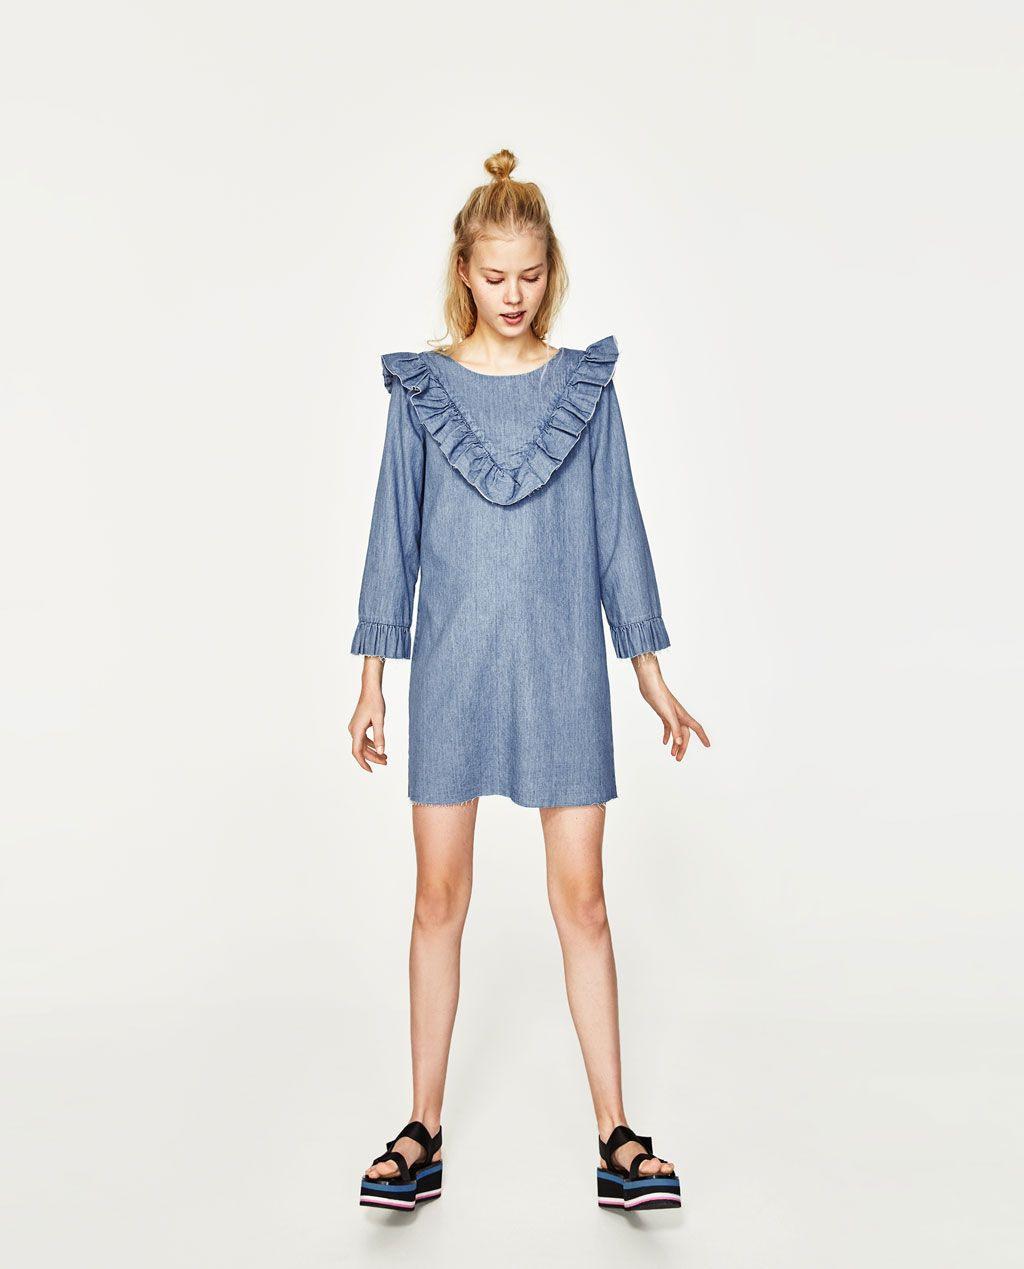 Image 1 Of Frilled Denim Dress From Zara  Dresses Shift